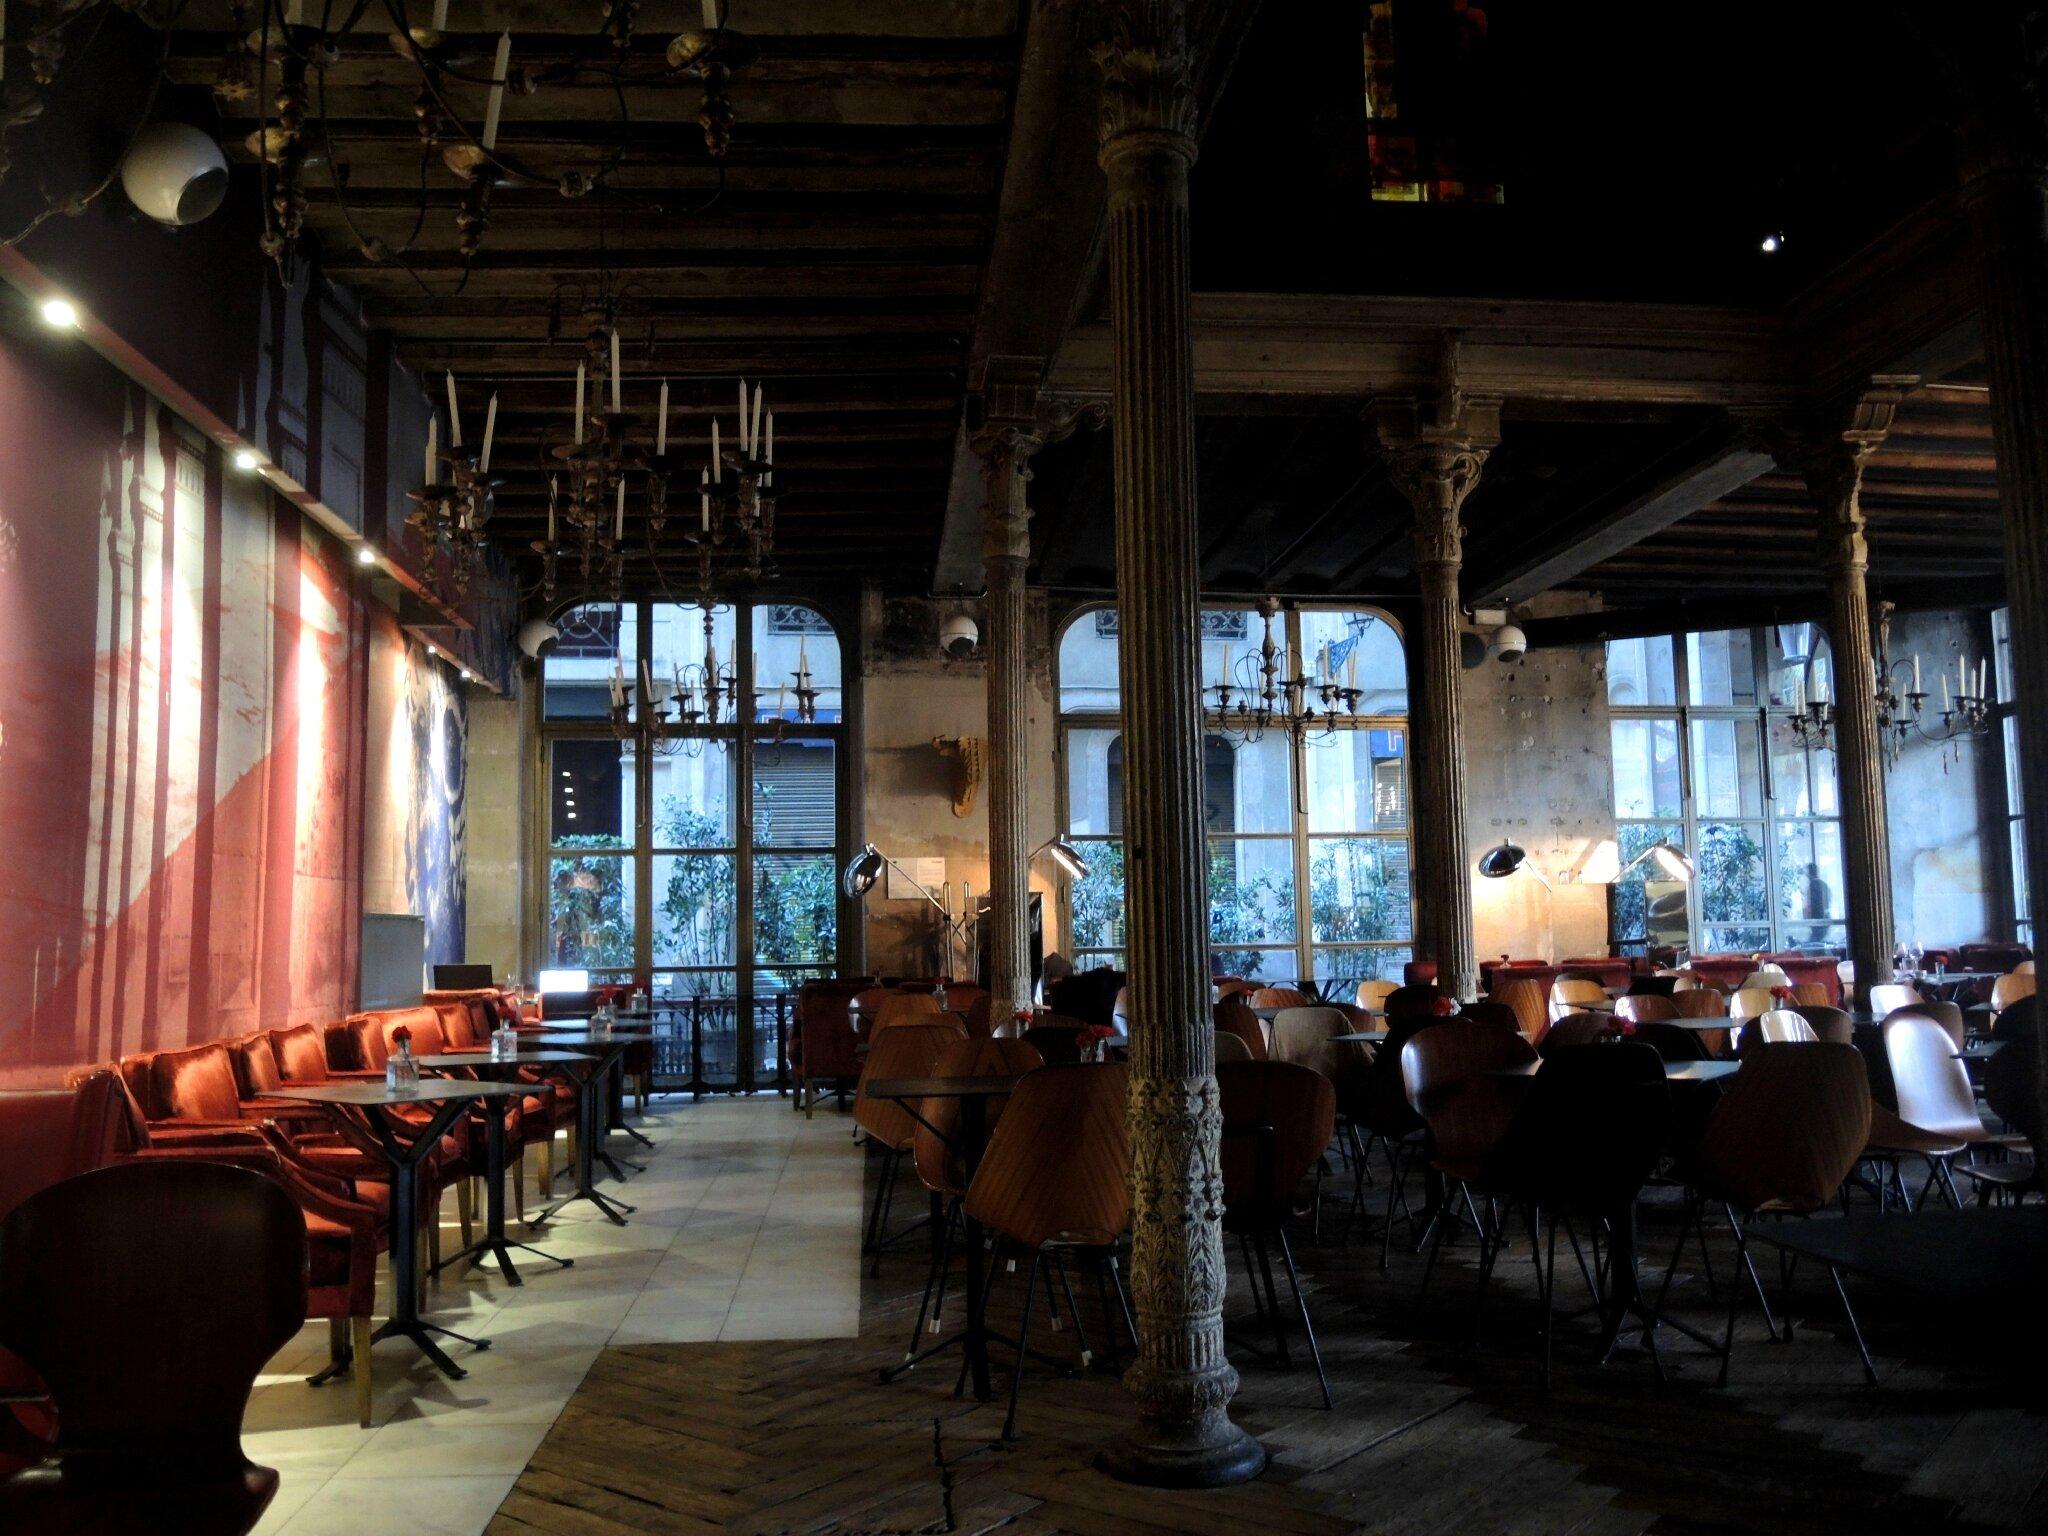 Barcelone, Bar Ocana, la salle (Espagne)